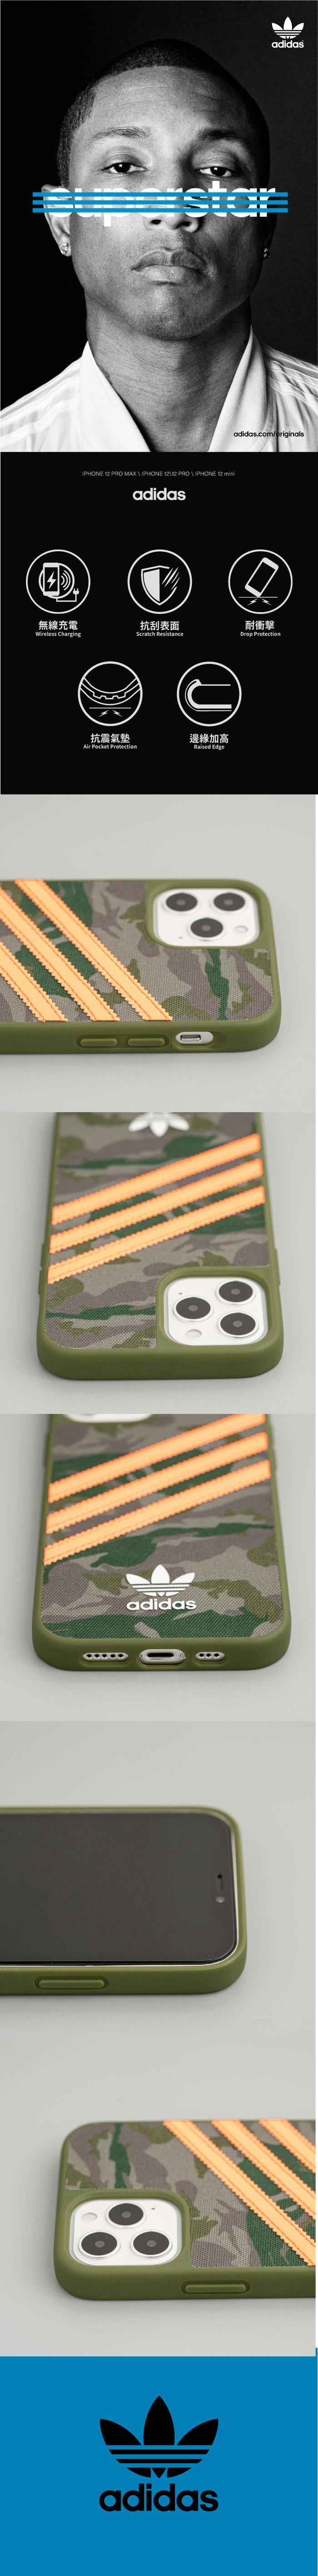 Adidas iPhone 12 Pro Max 手機殼 Originals 經典三線 迷彩系列